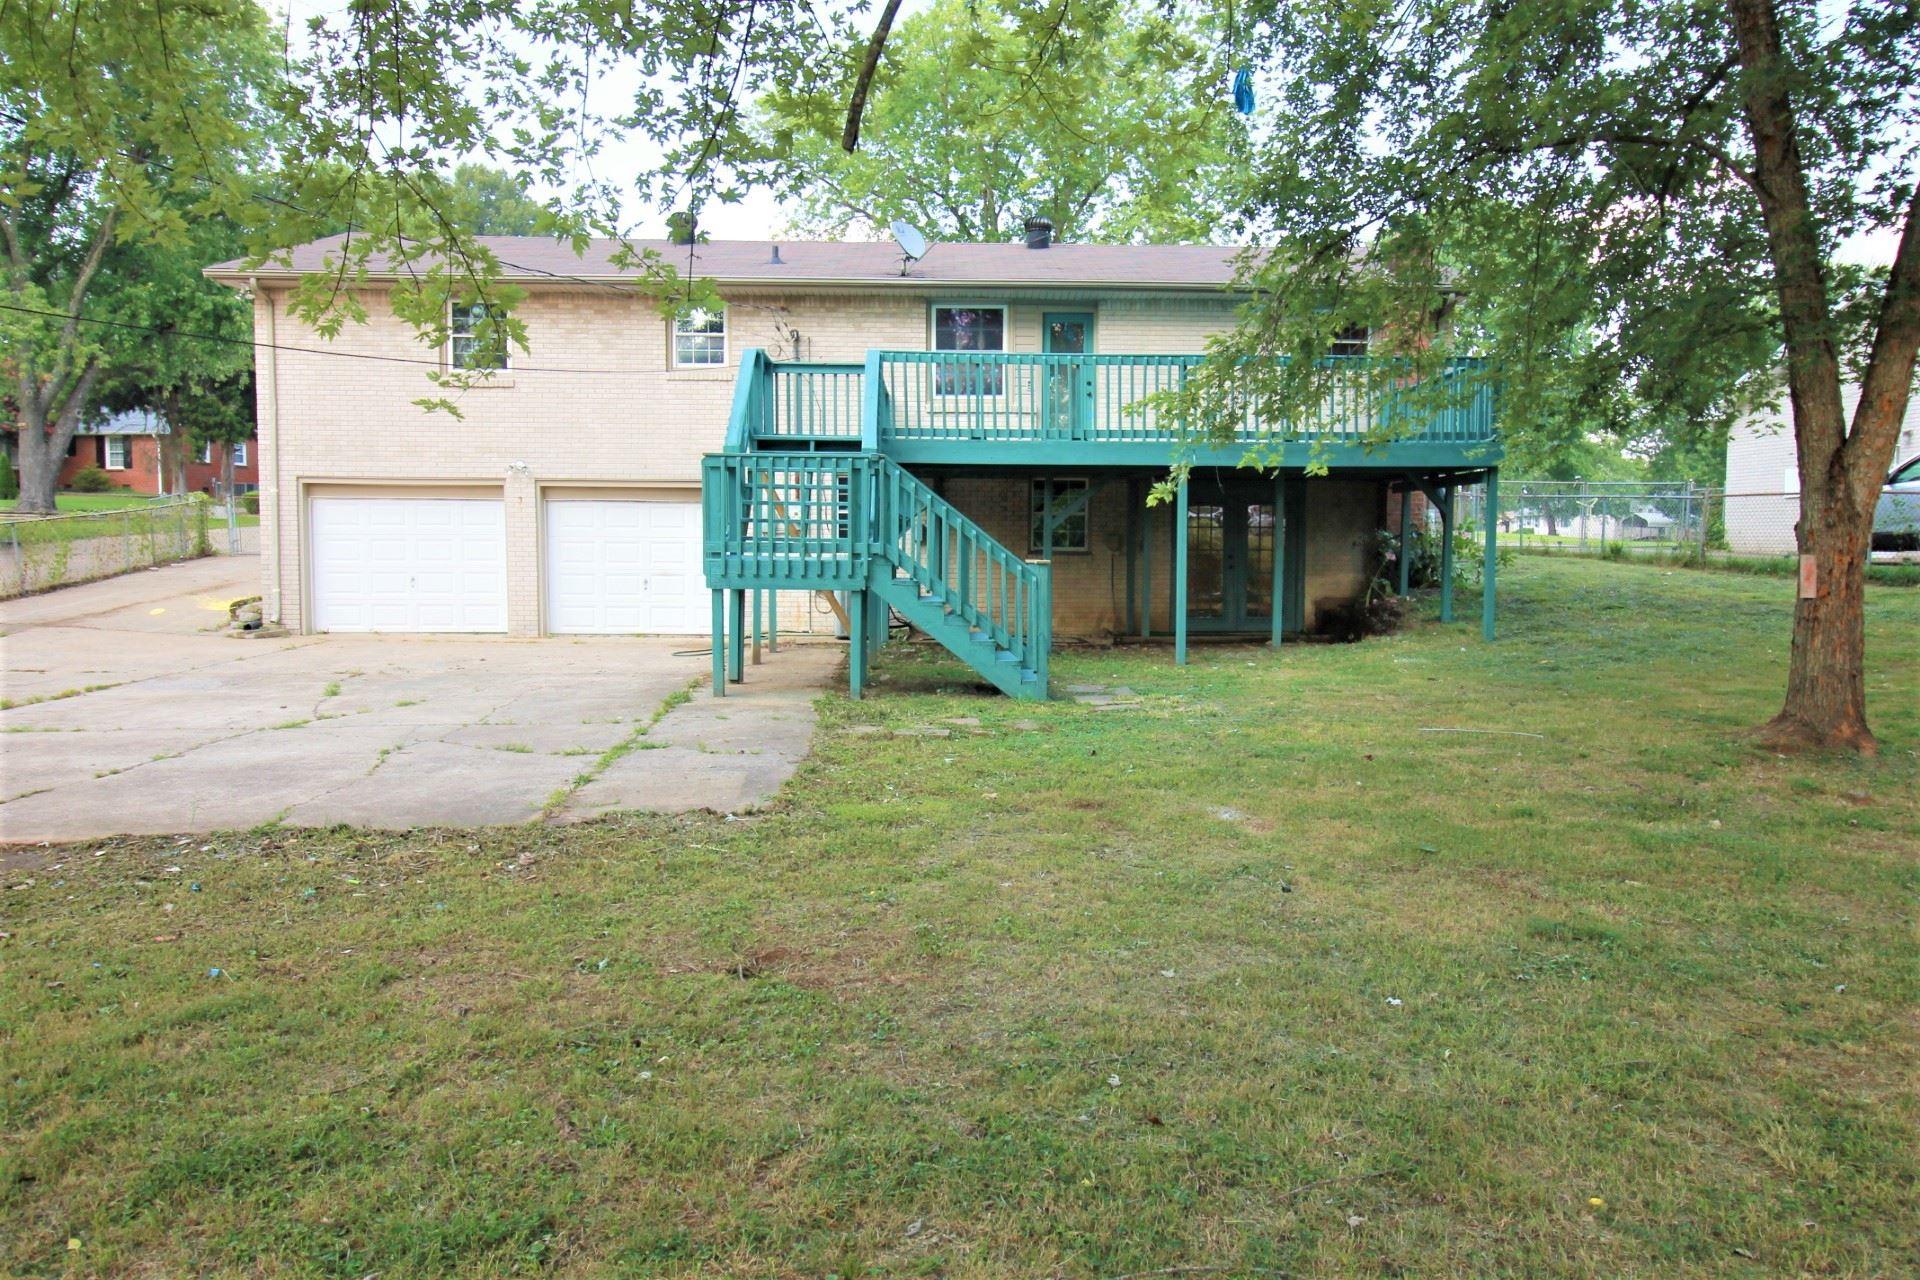 1567 Armistead Dr, Clarksville, TN 37042 - MLS#: 2277867